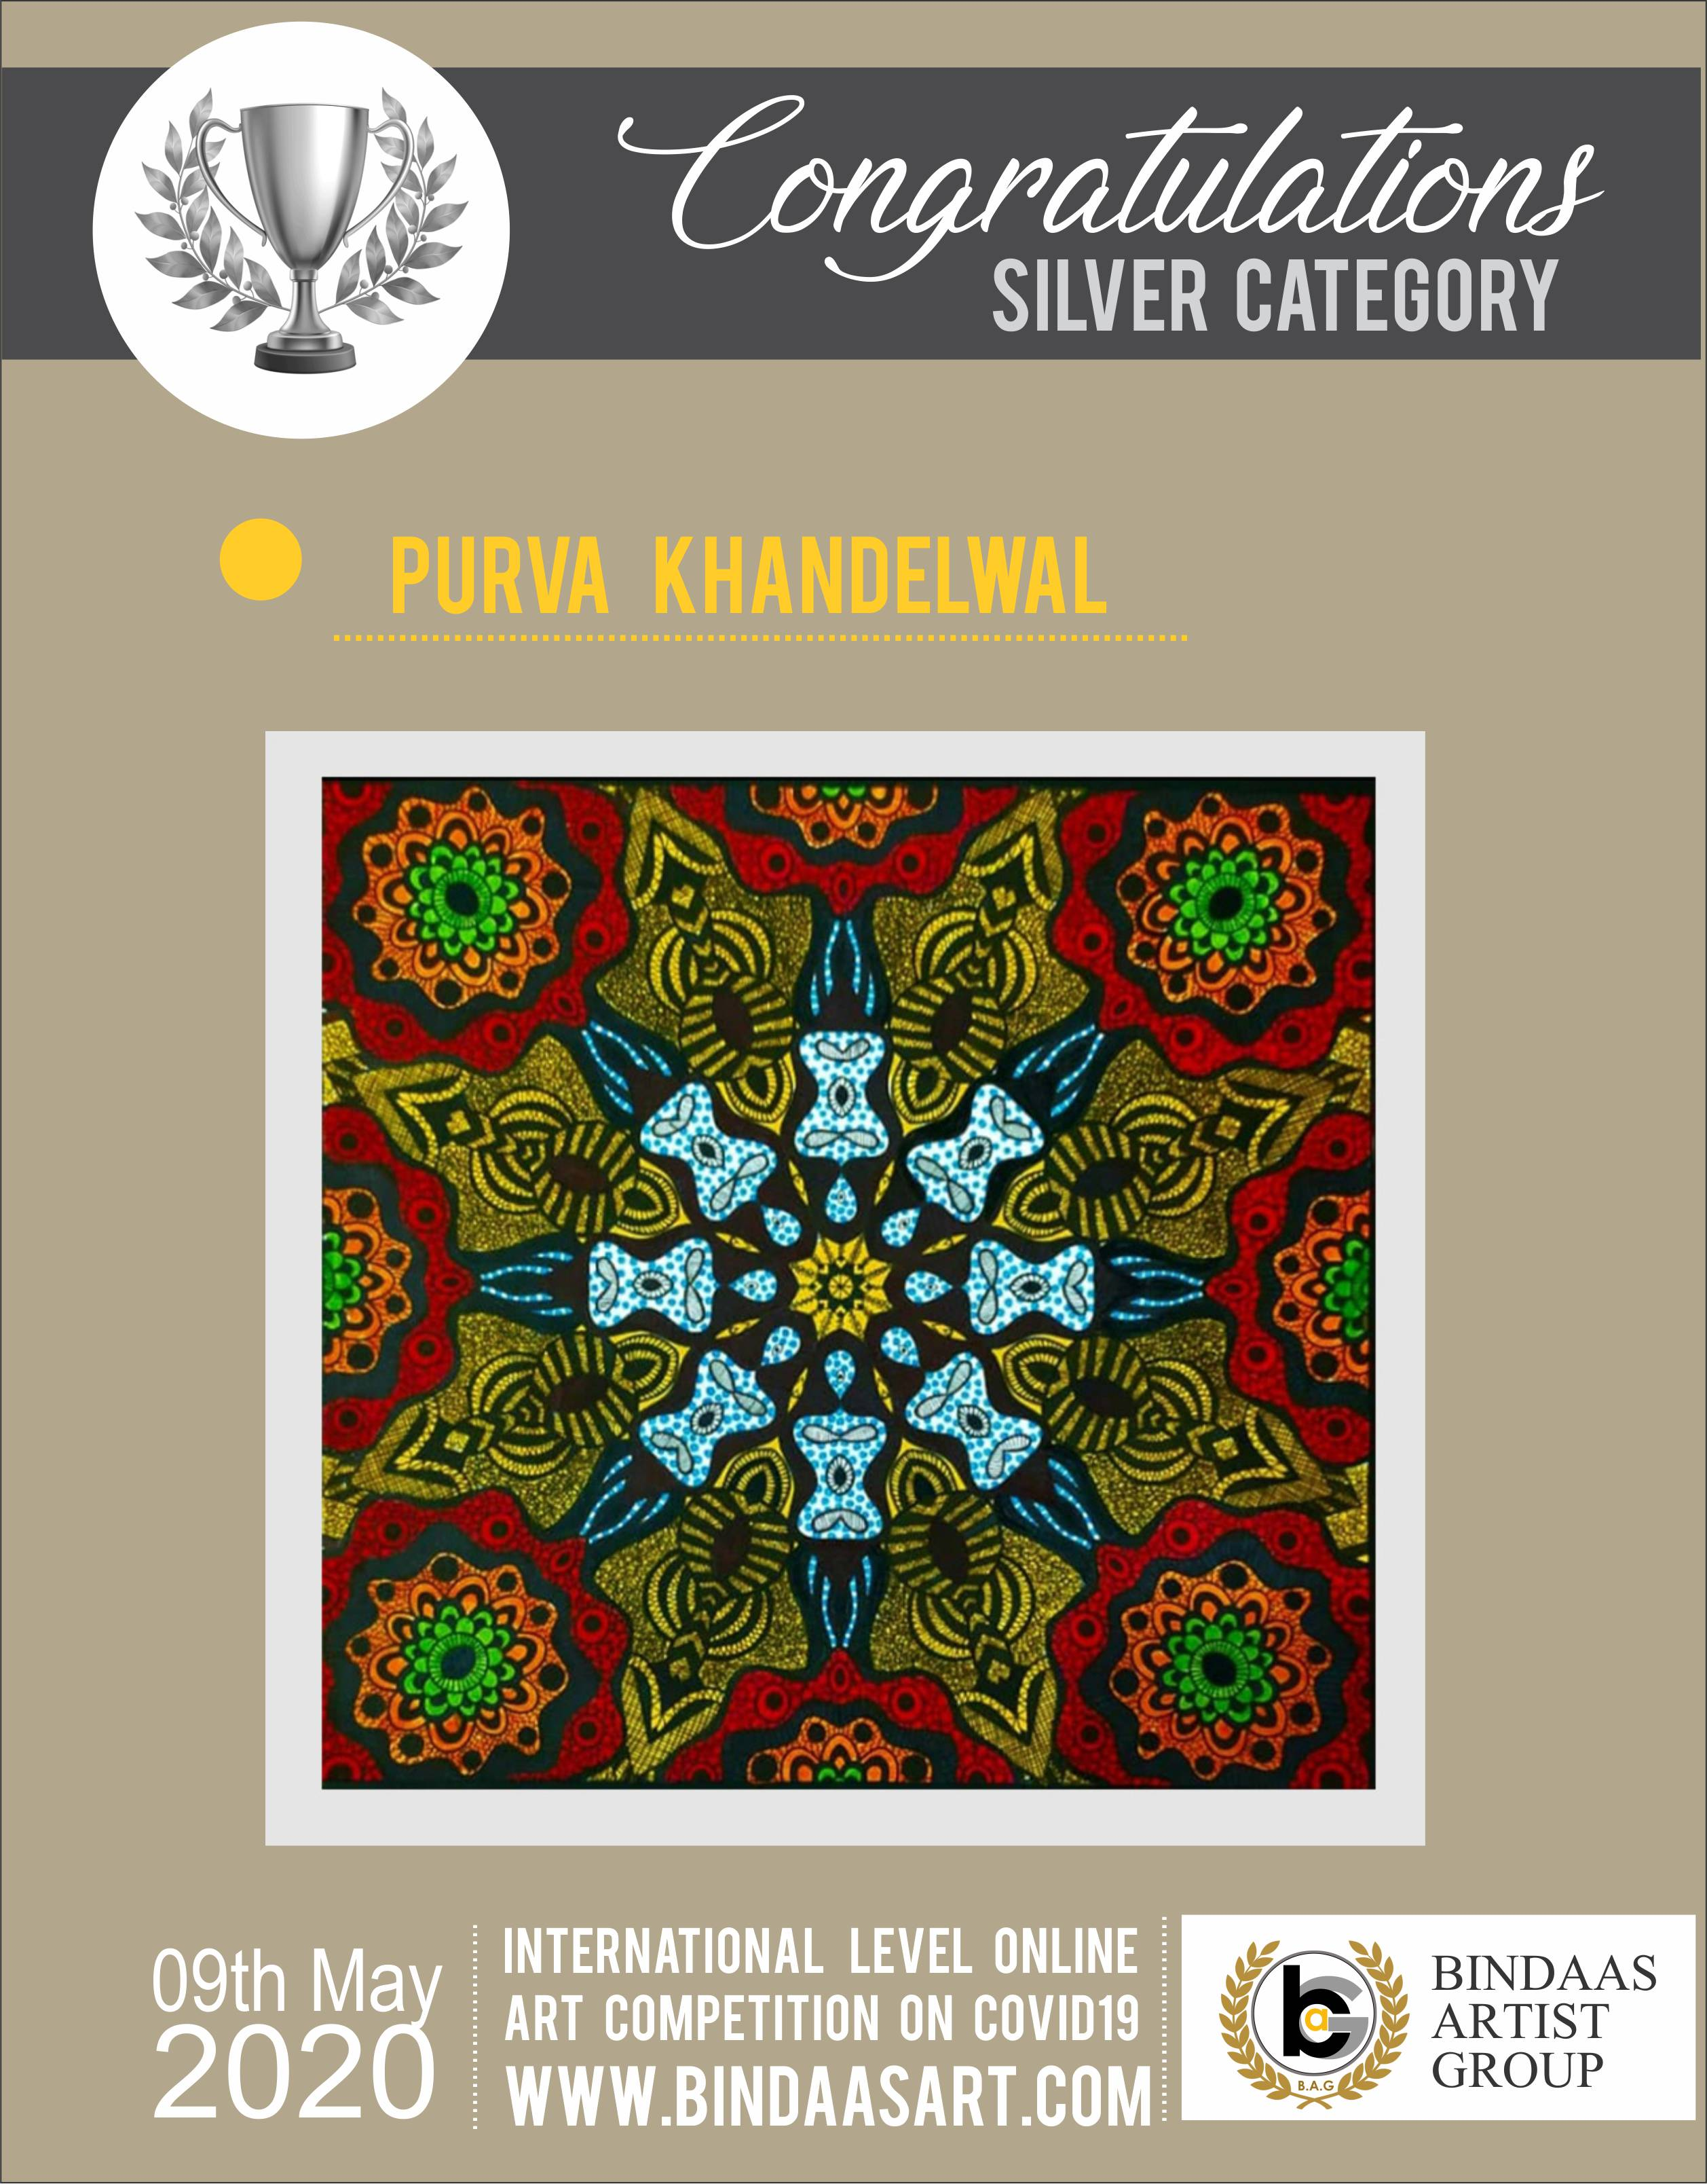 purva khandelwal